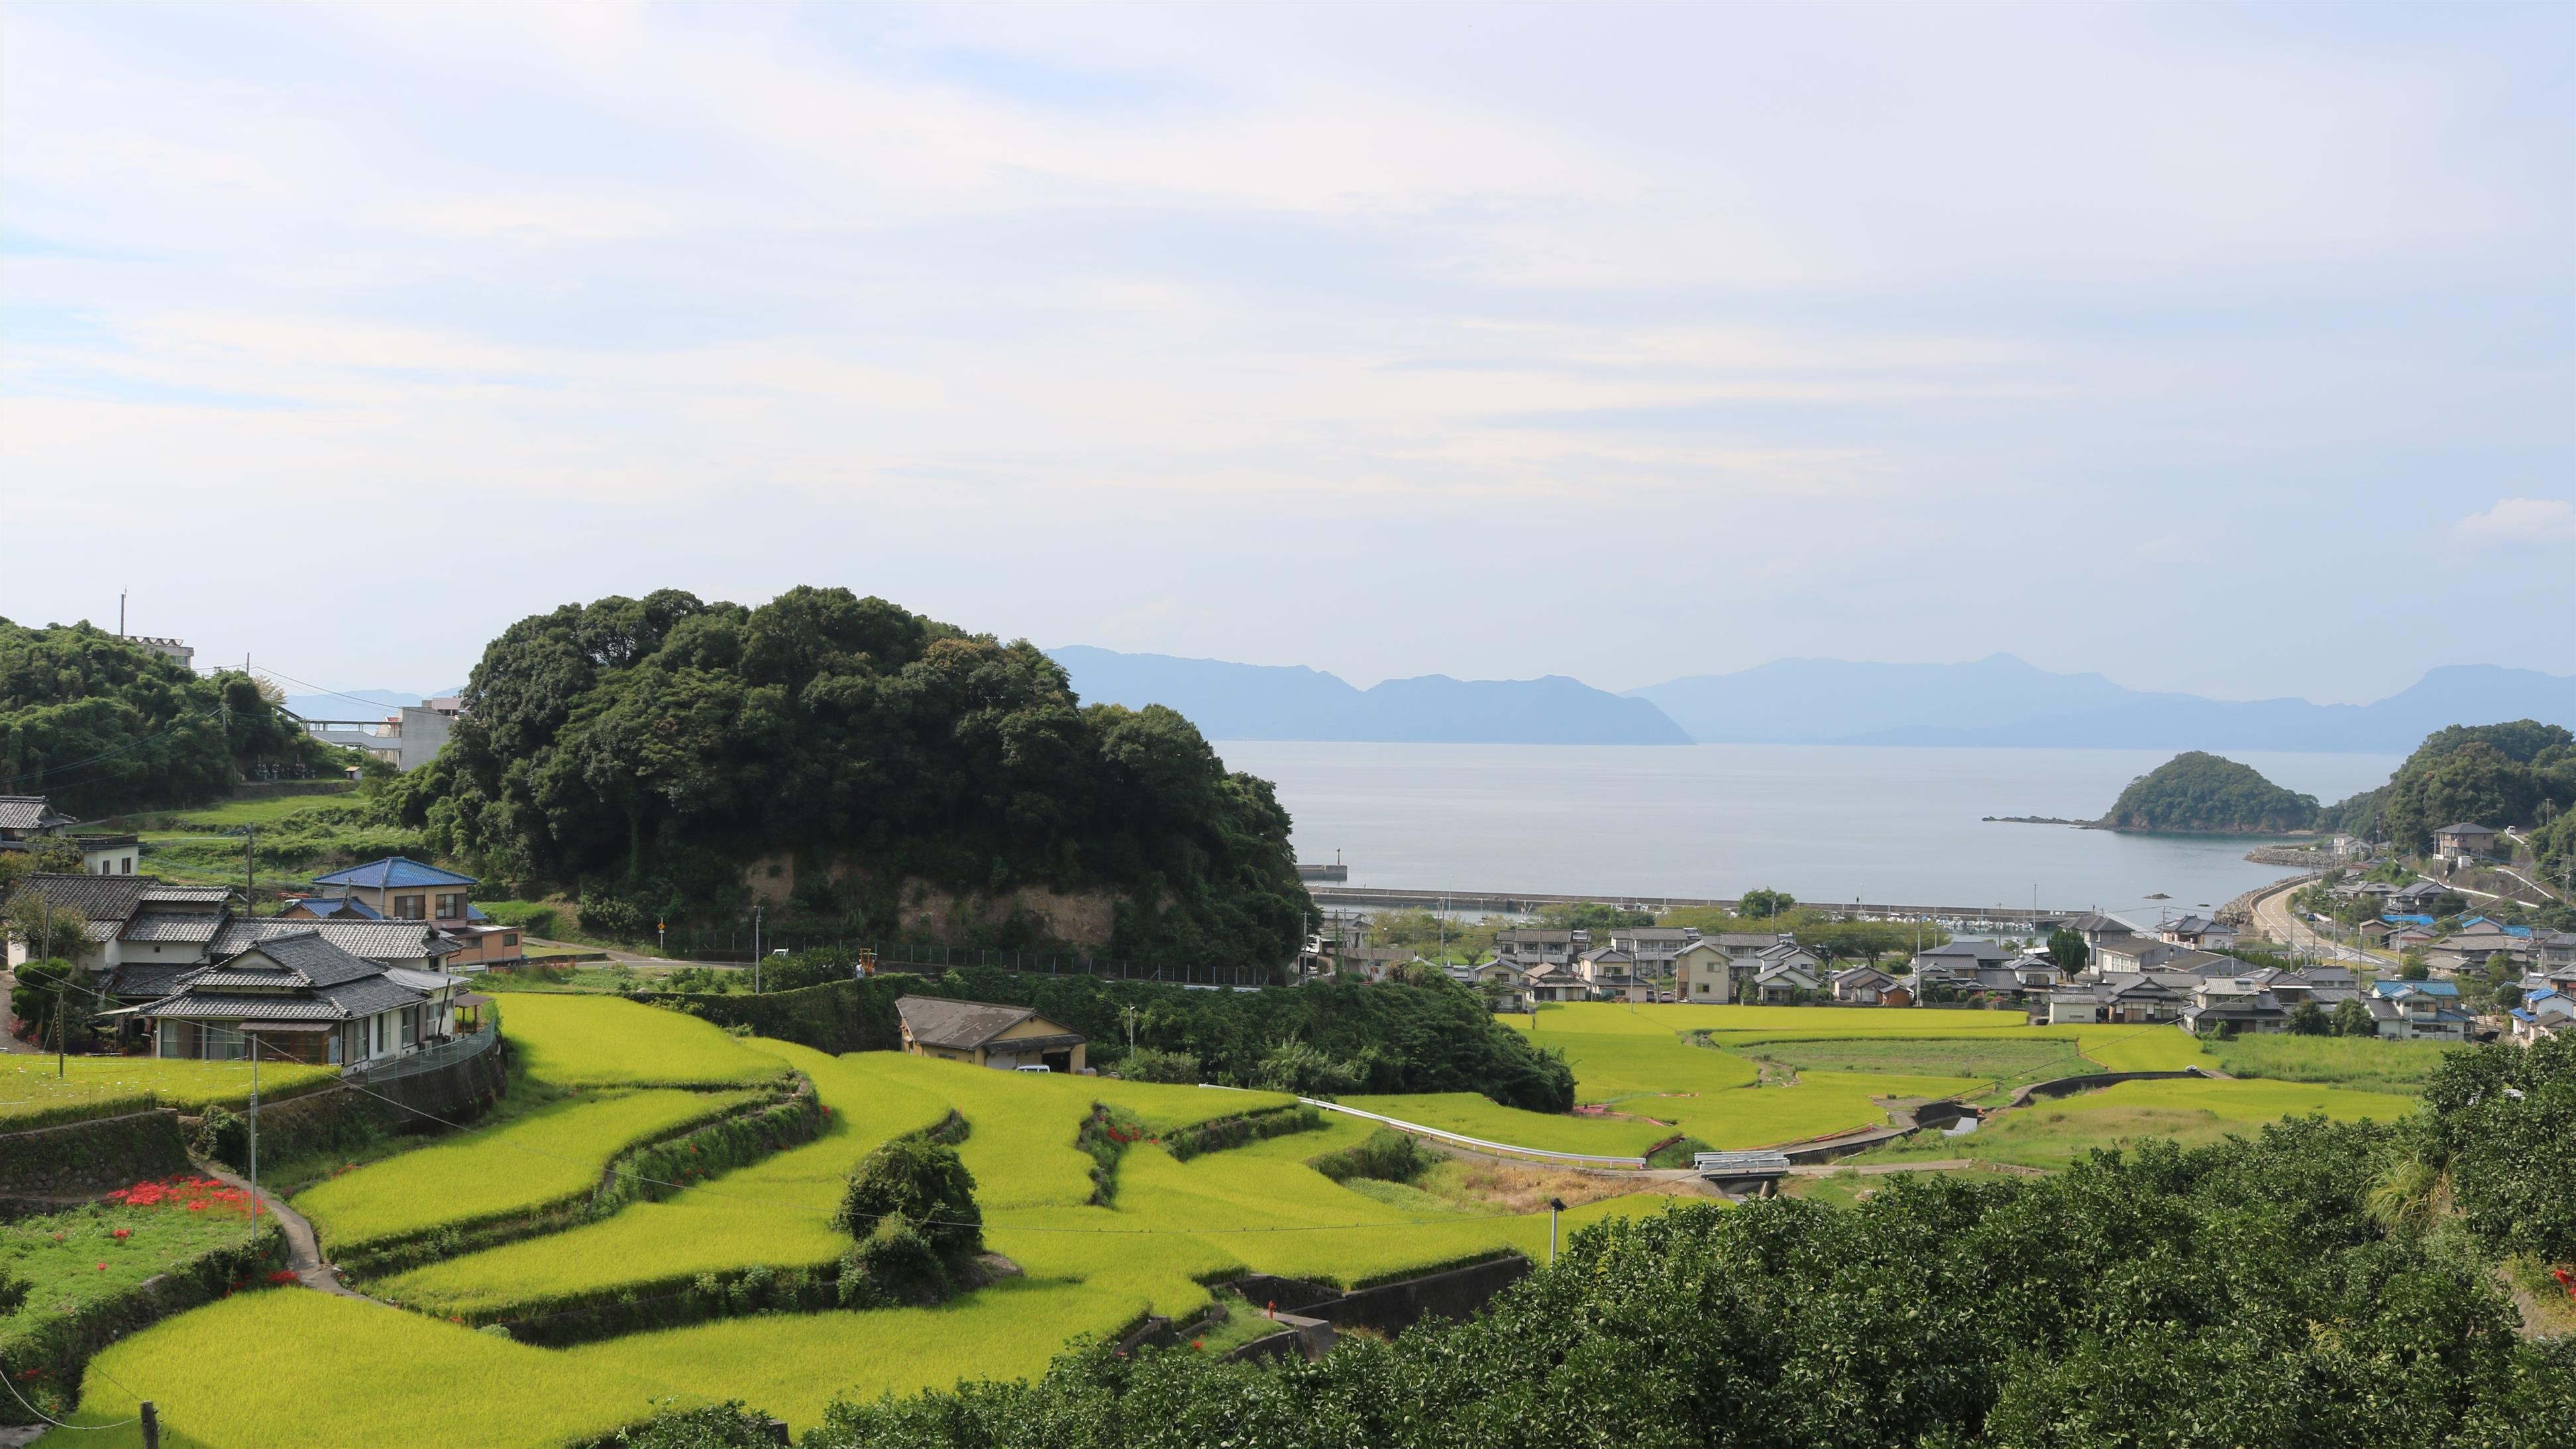 津奈木町の田園風景